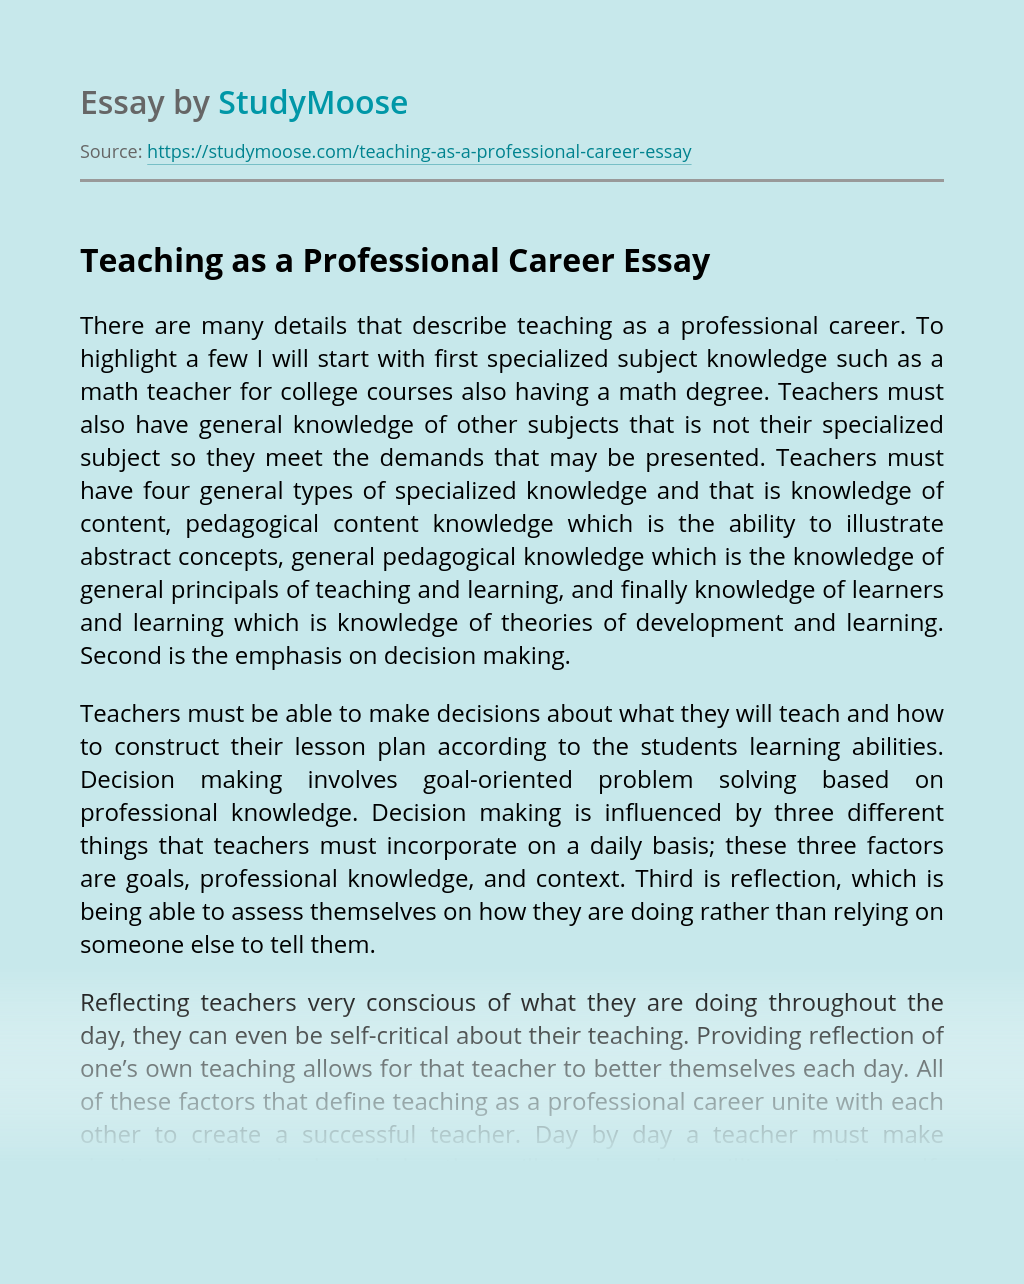 Teaching as a Professional Career